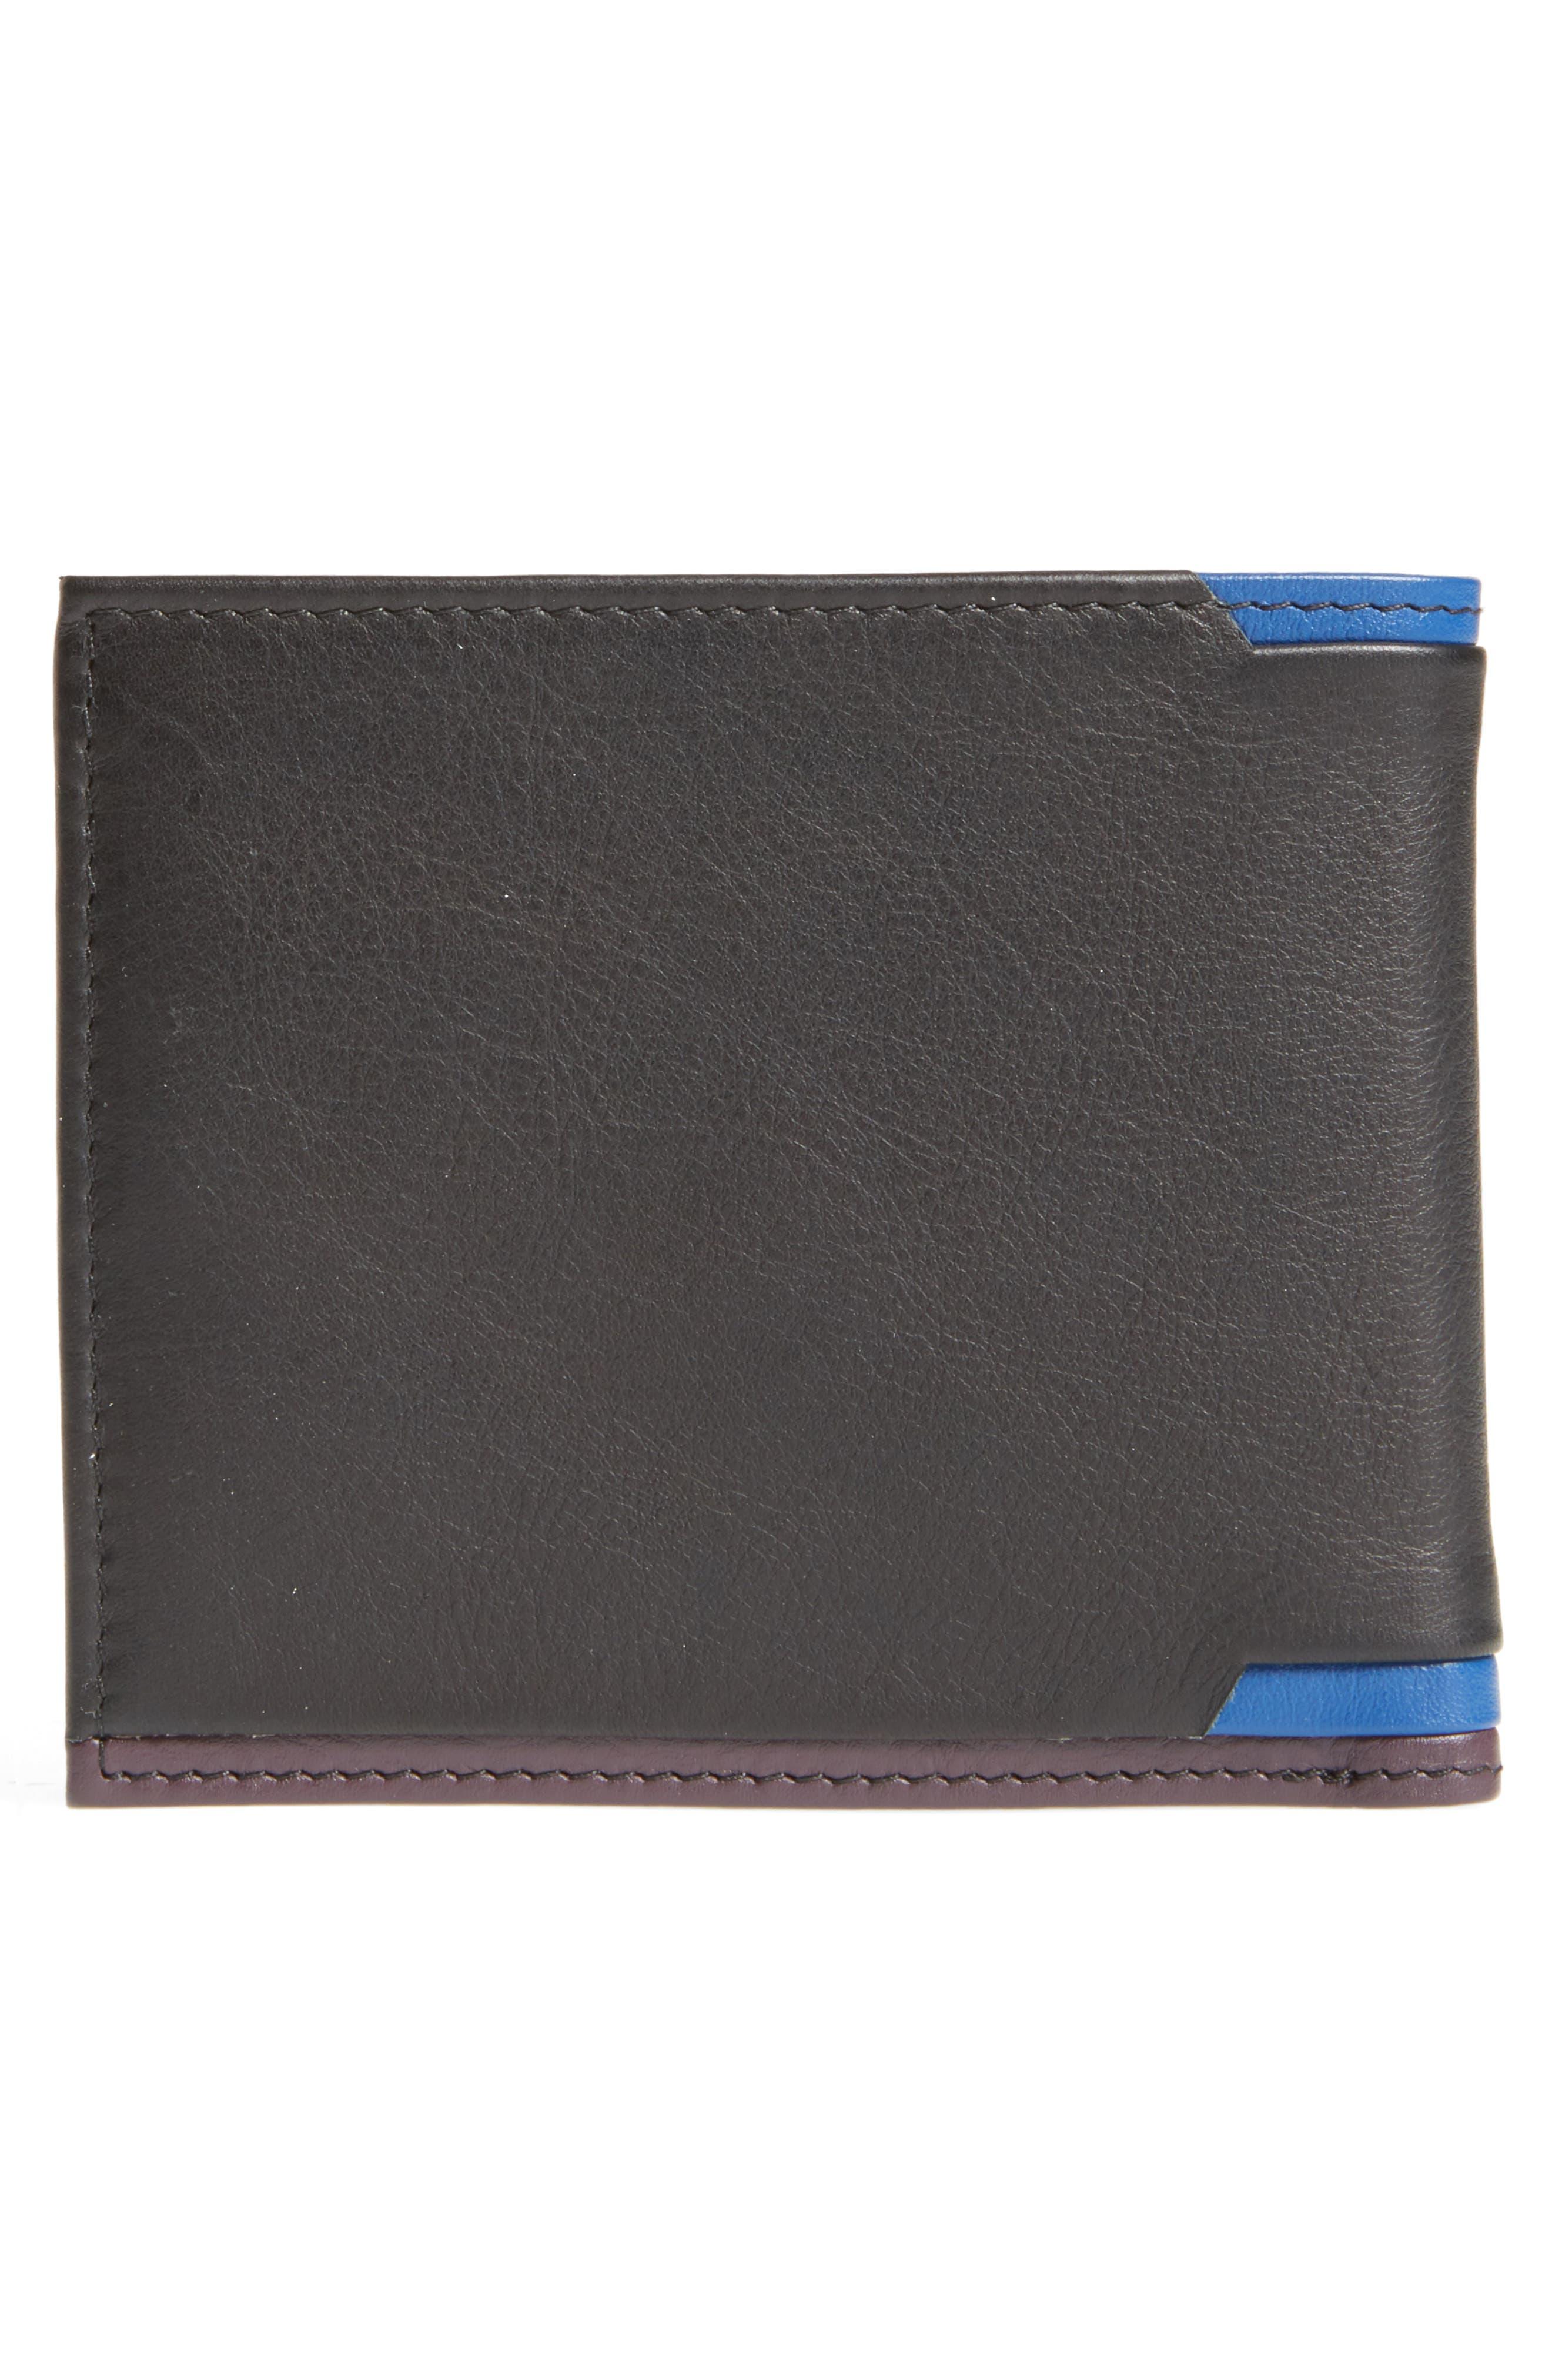 Baldi Corner Detail Leather Wallet,                             Alternate thumbnail 3, color,                             Black